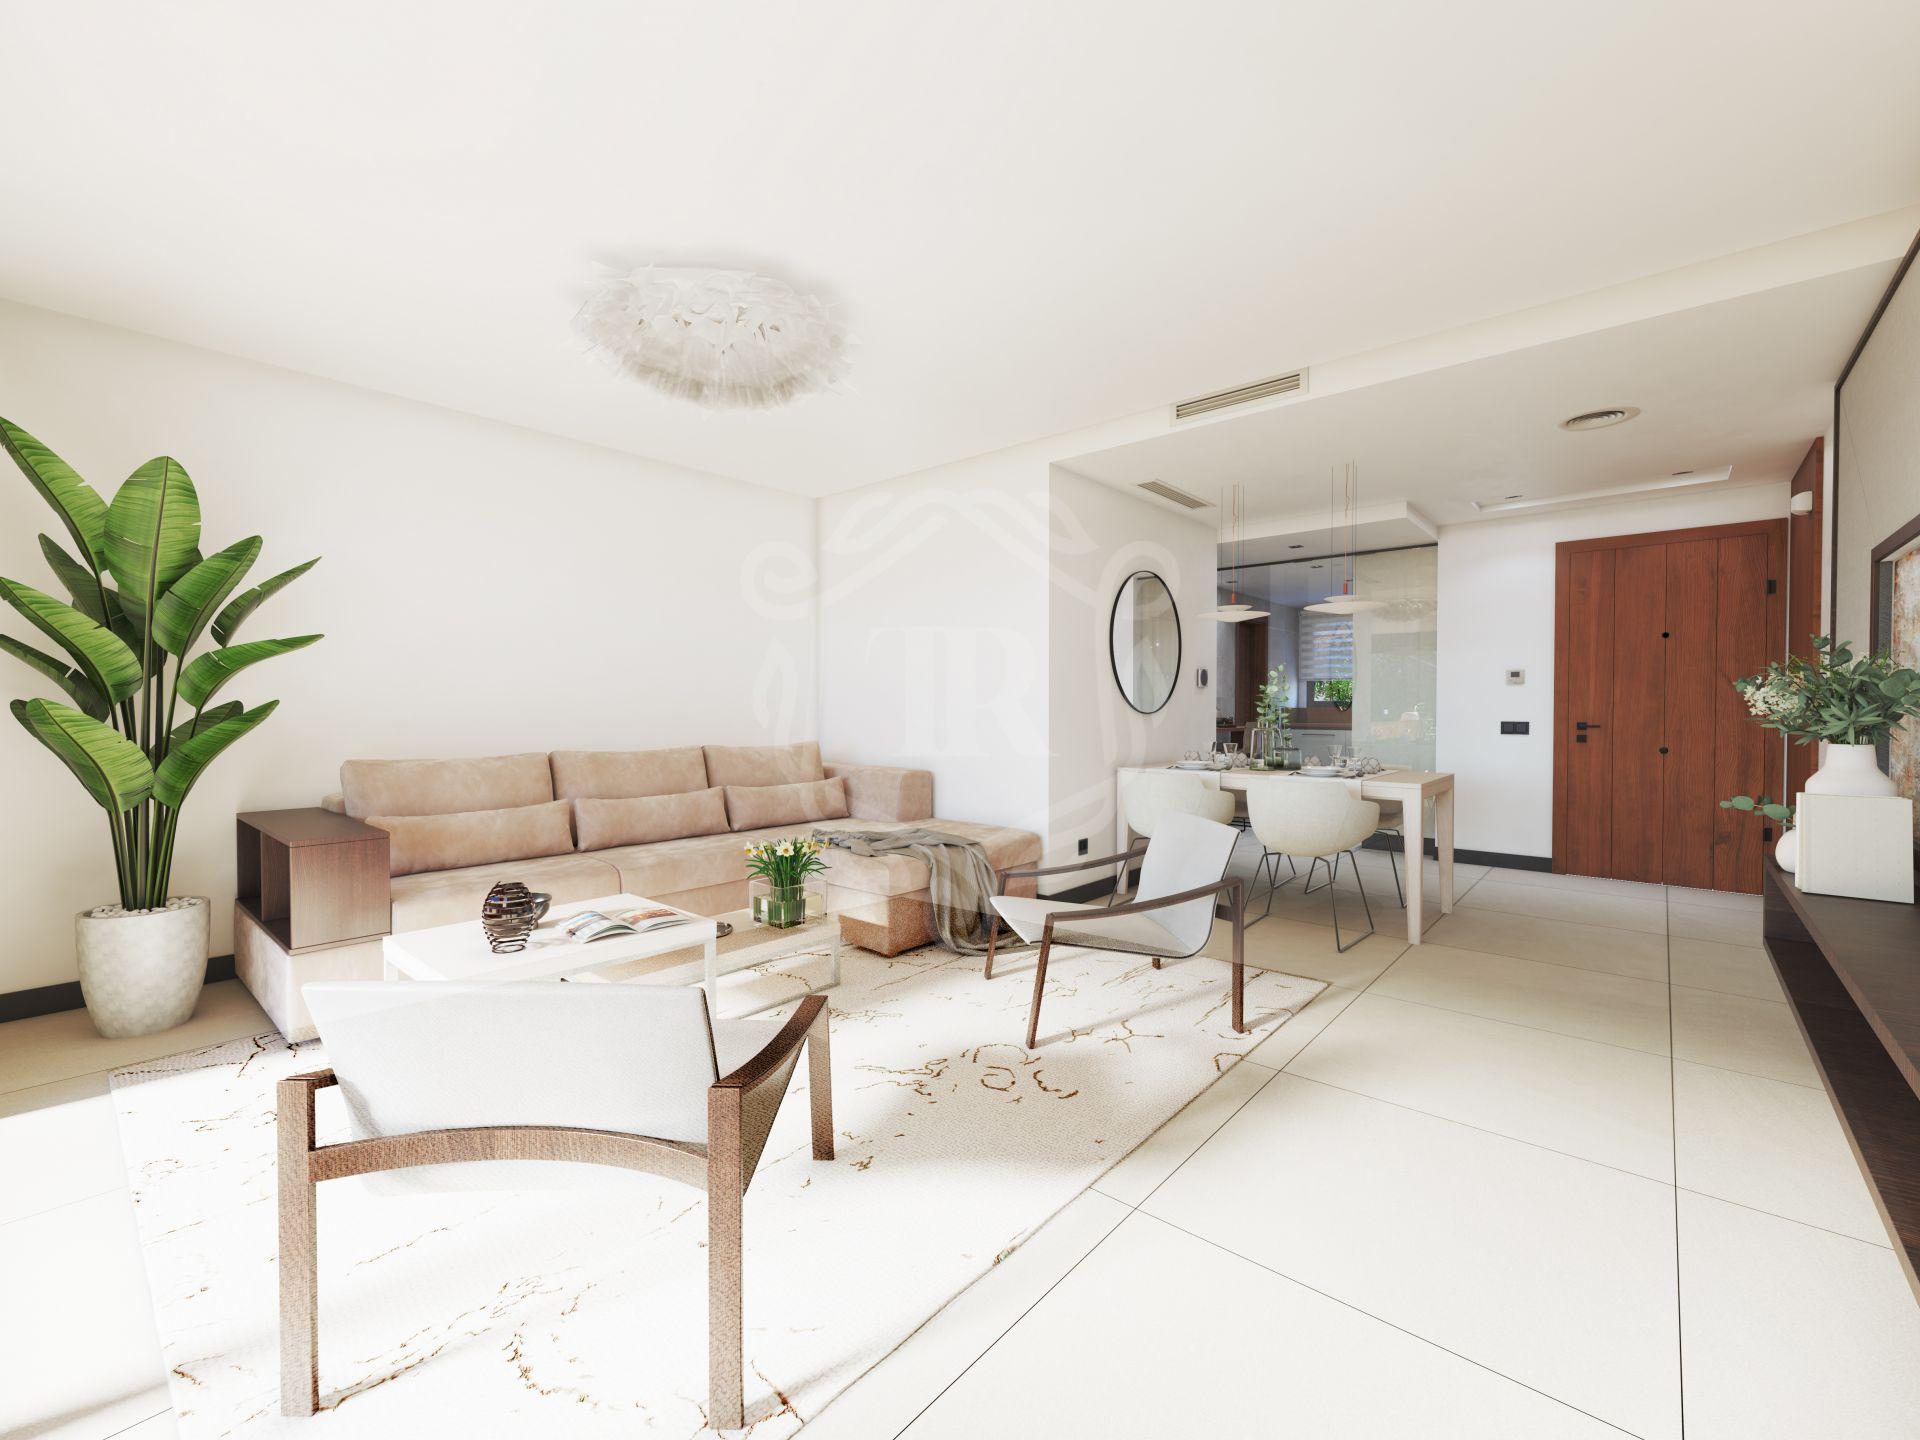 Duplex Penthouse for sale in La Cerquilla, Nueva Andalucia